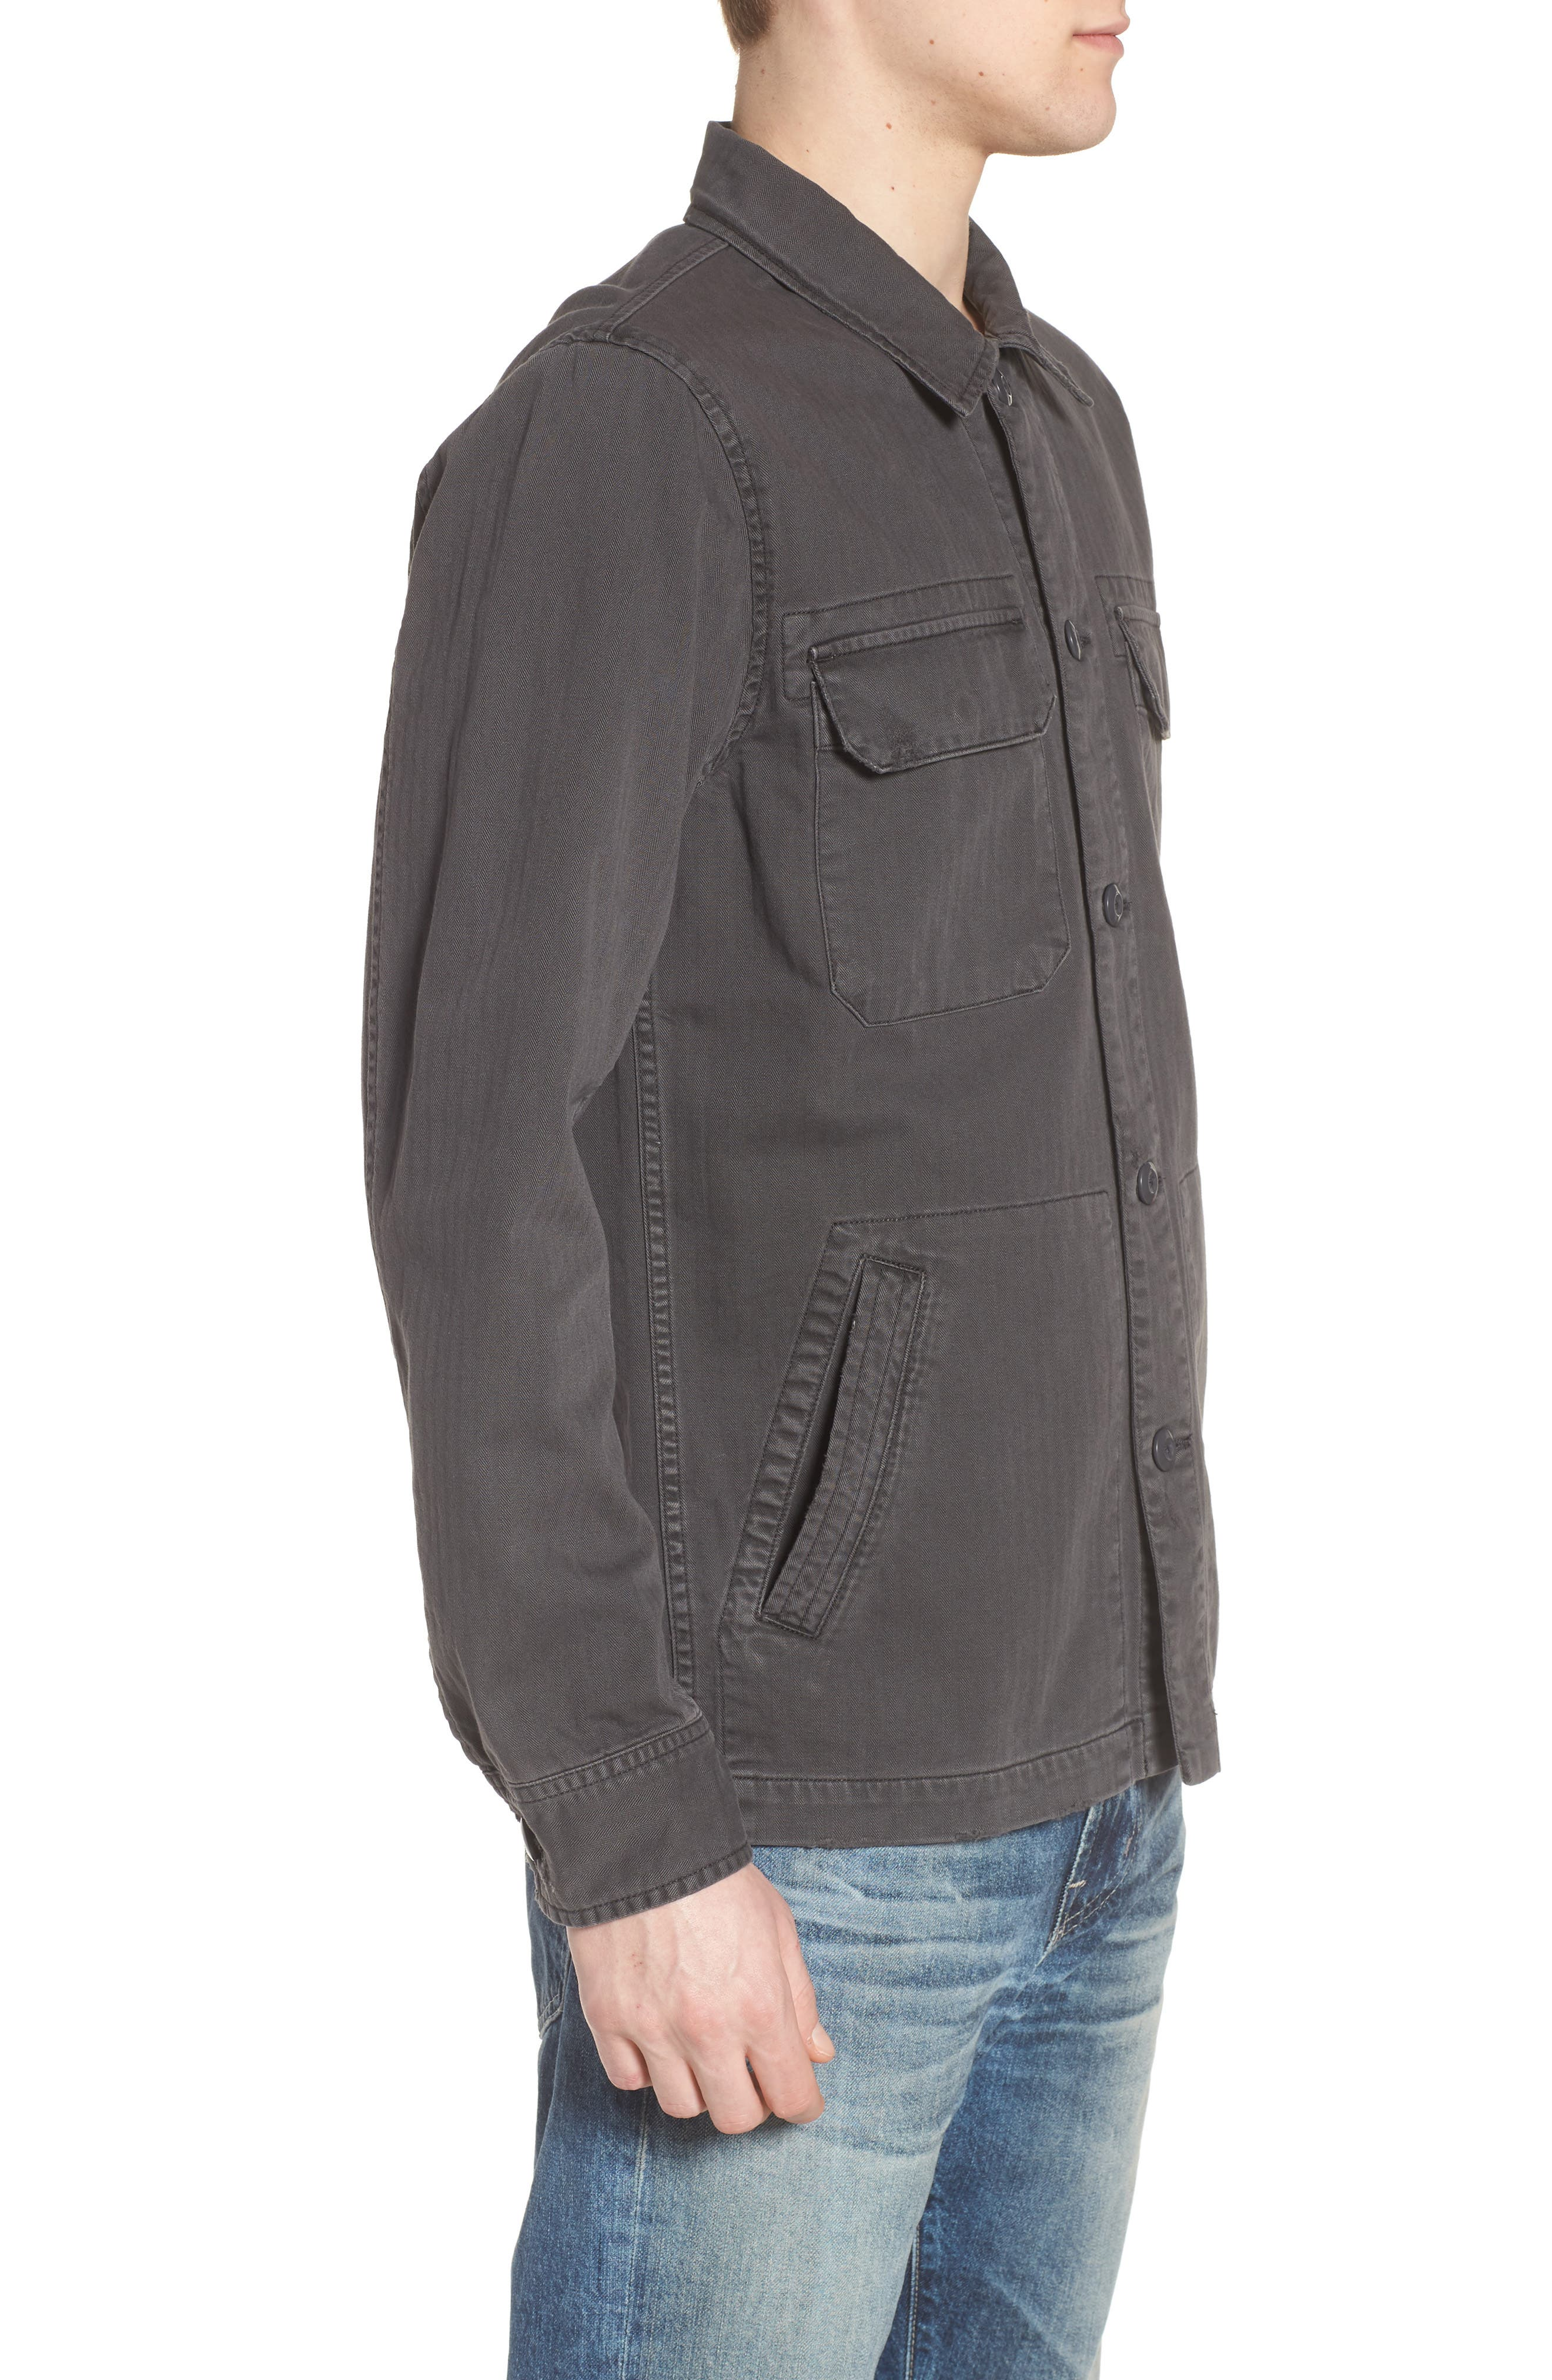 Marx Slim Fit Jacket,                             Alternate thumbnail 3, color,                             5 Years Pigment Smoke Grey